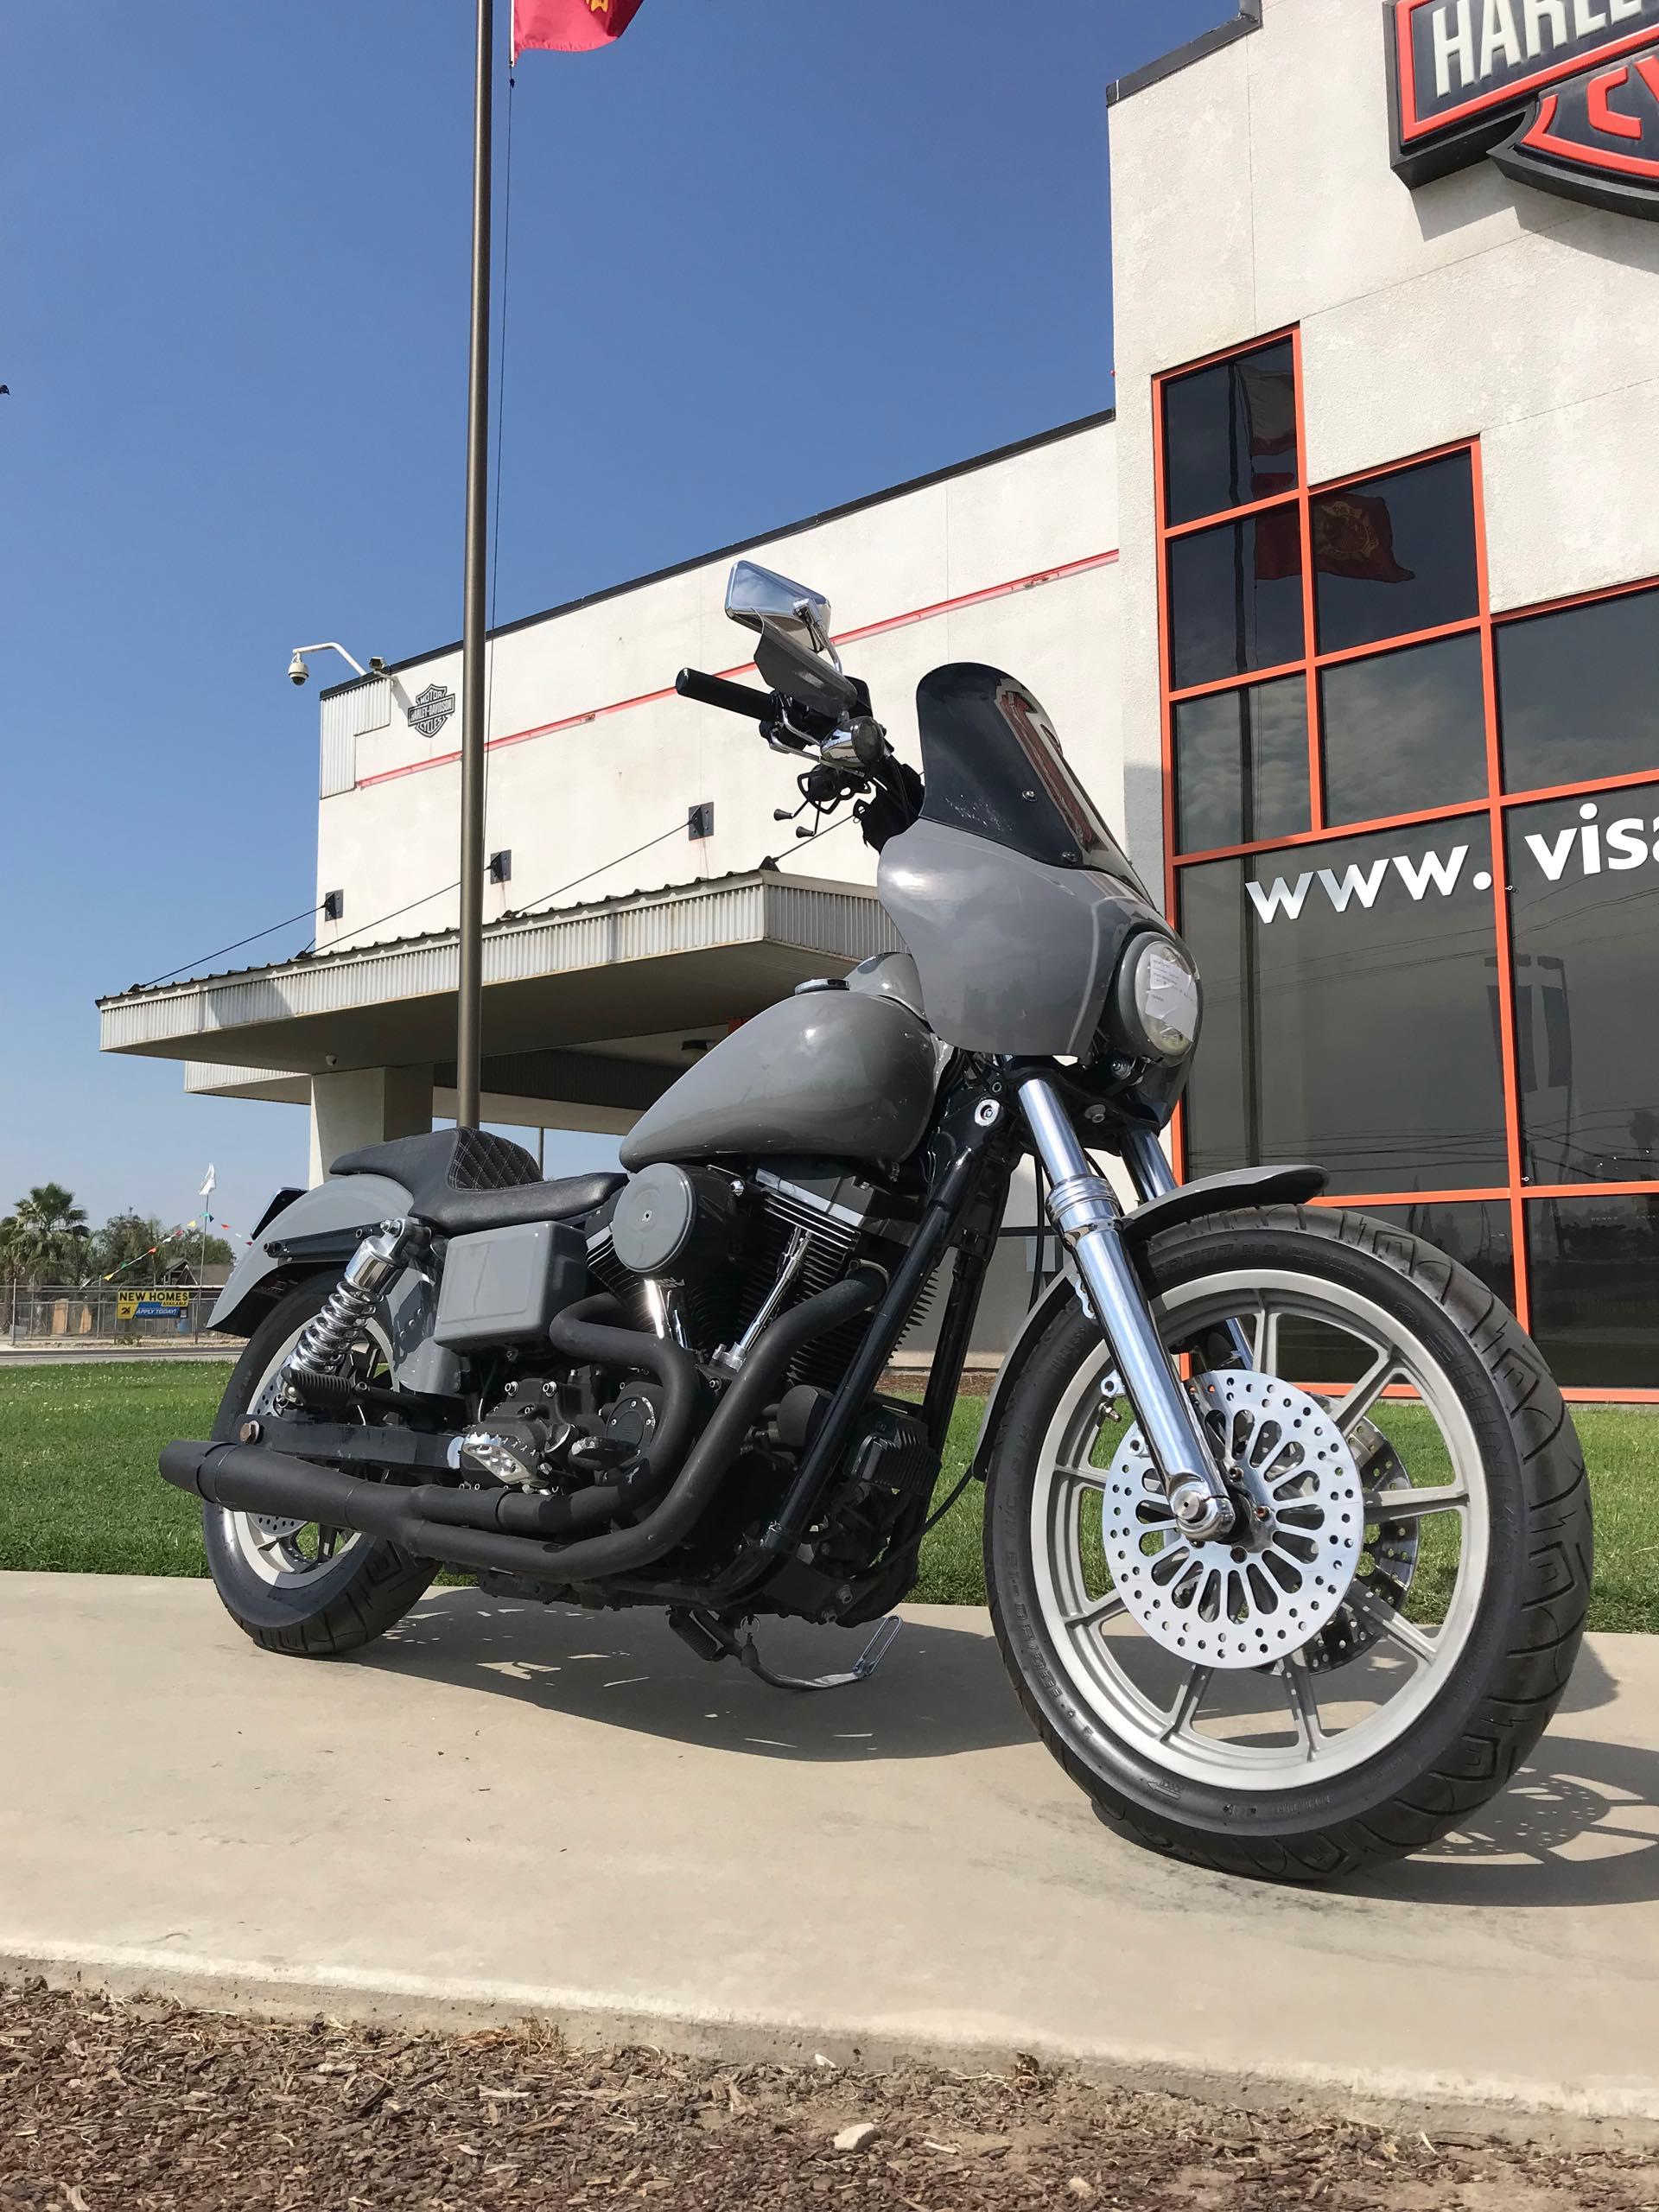 2014 Harley-Davidson Dyna Street Bob at Visalia Harley-Davidson